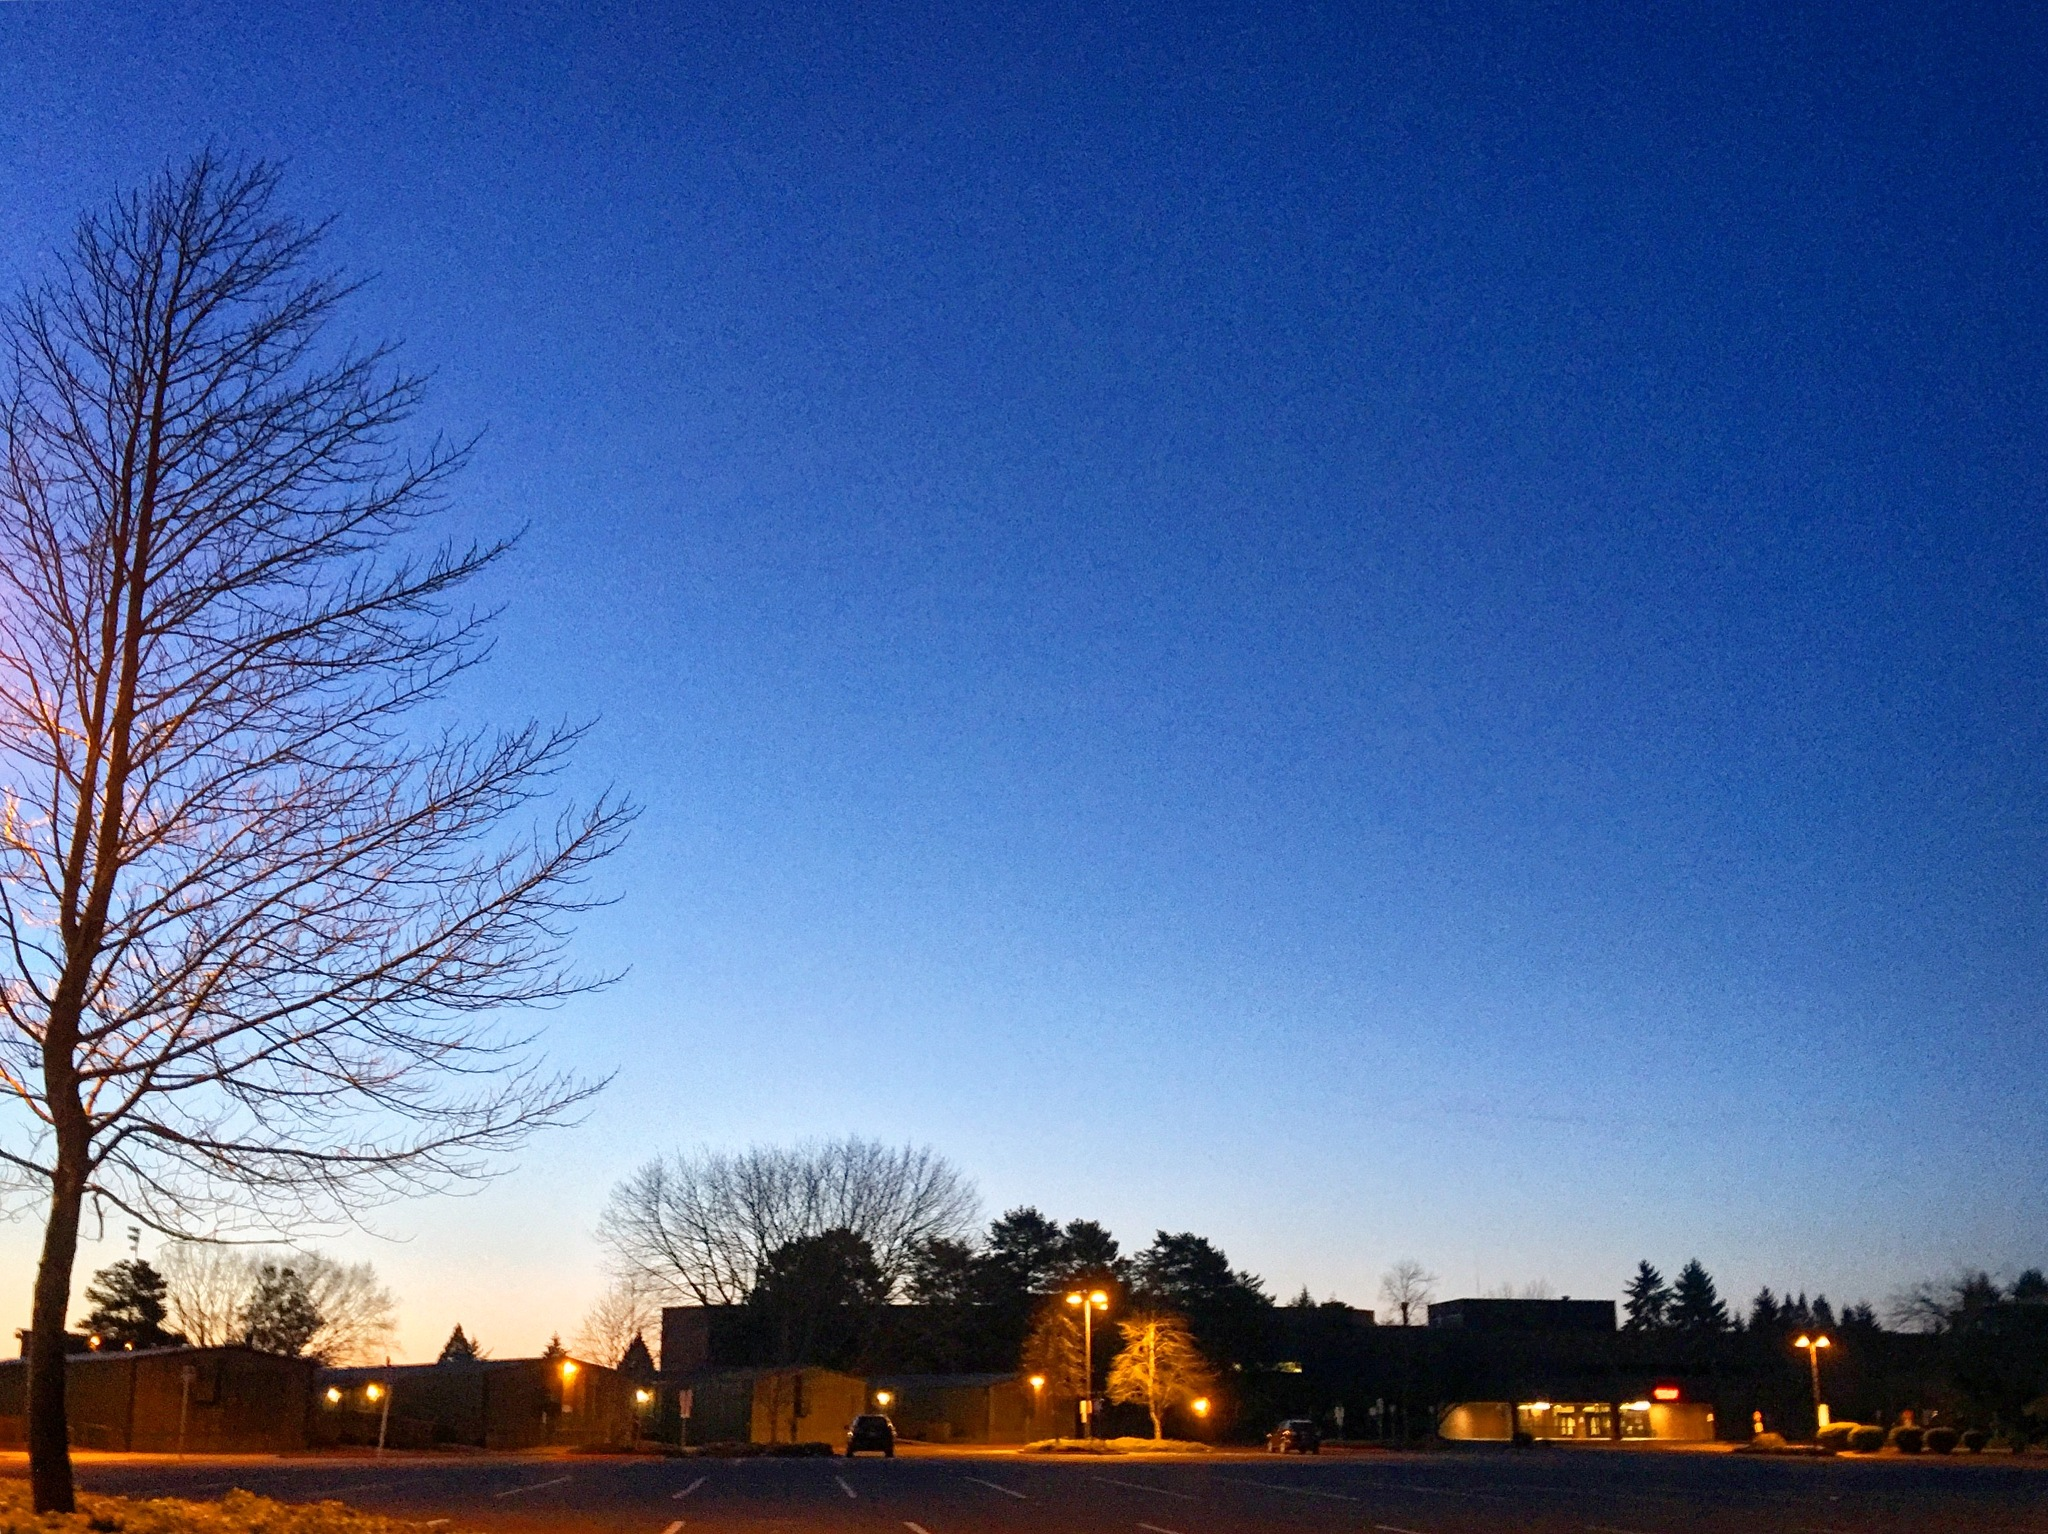 Mysterious Sunrise  by Ngoc-Tram Tran